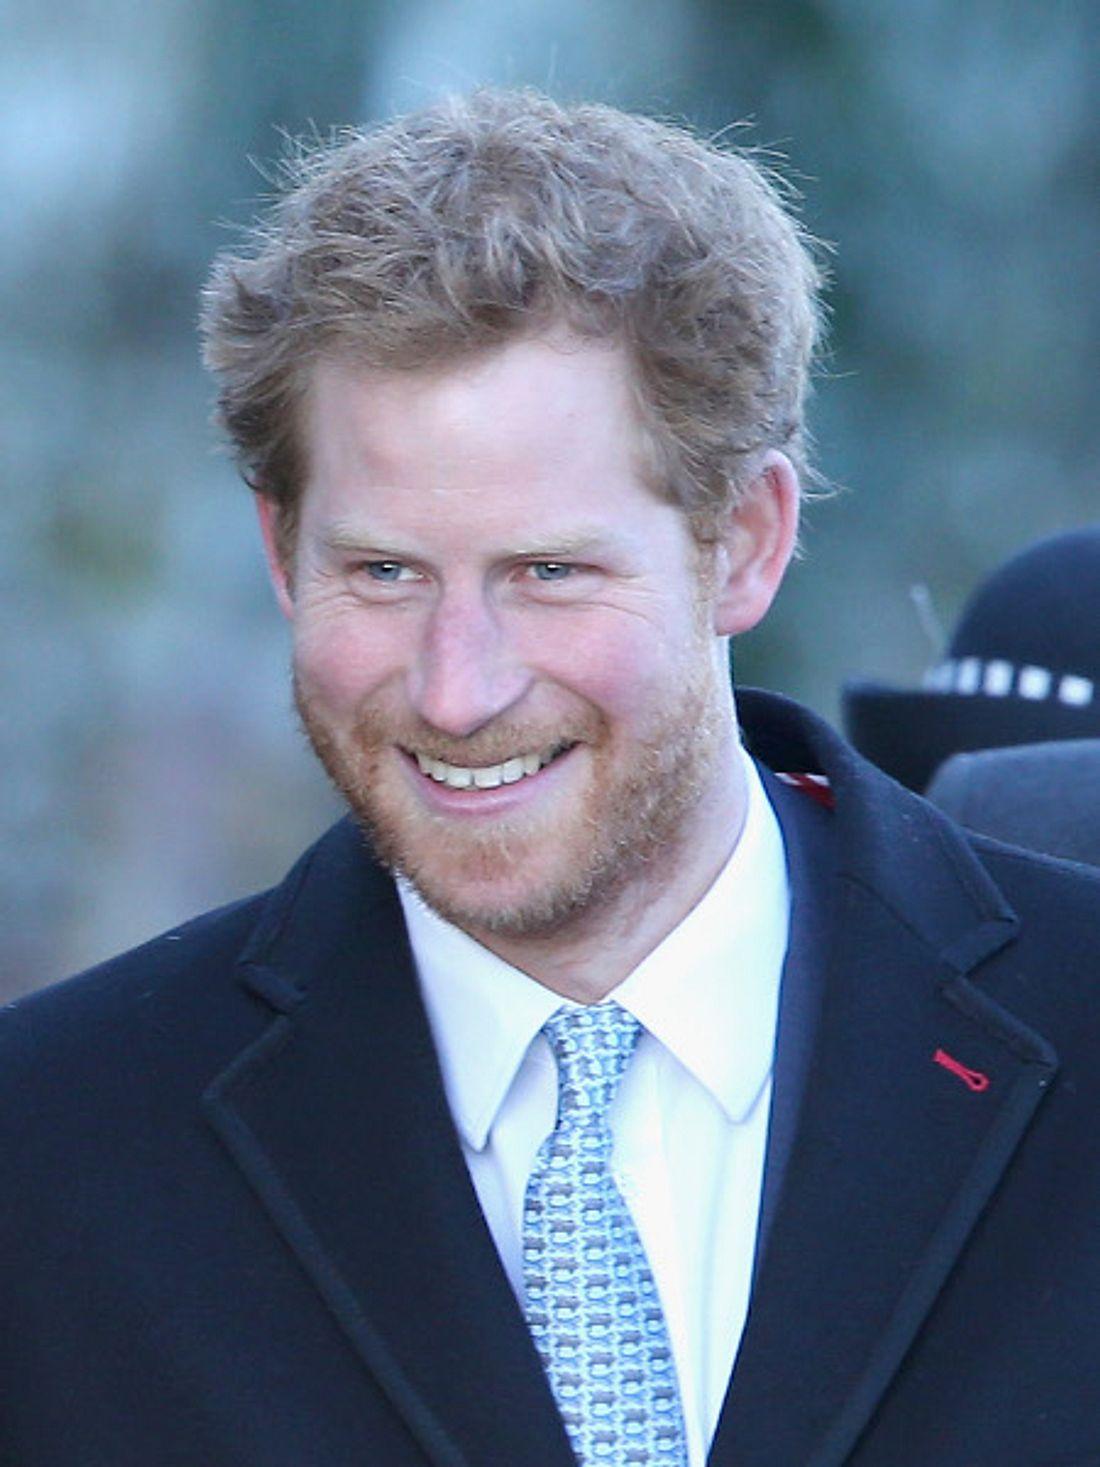 Prinz Harry mit royalem Vollbart.